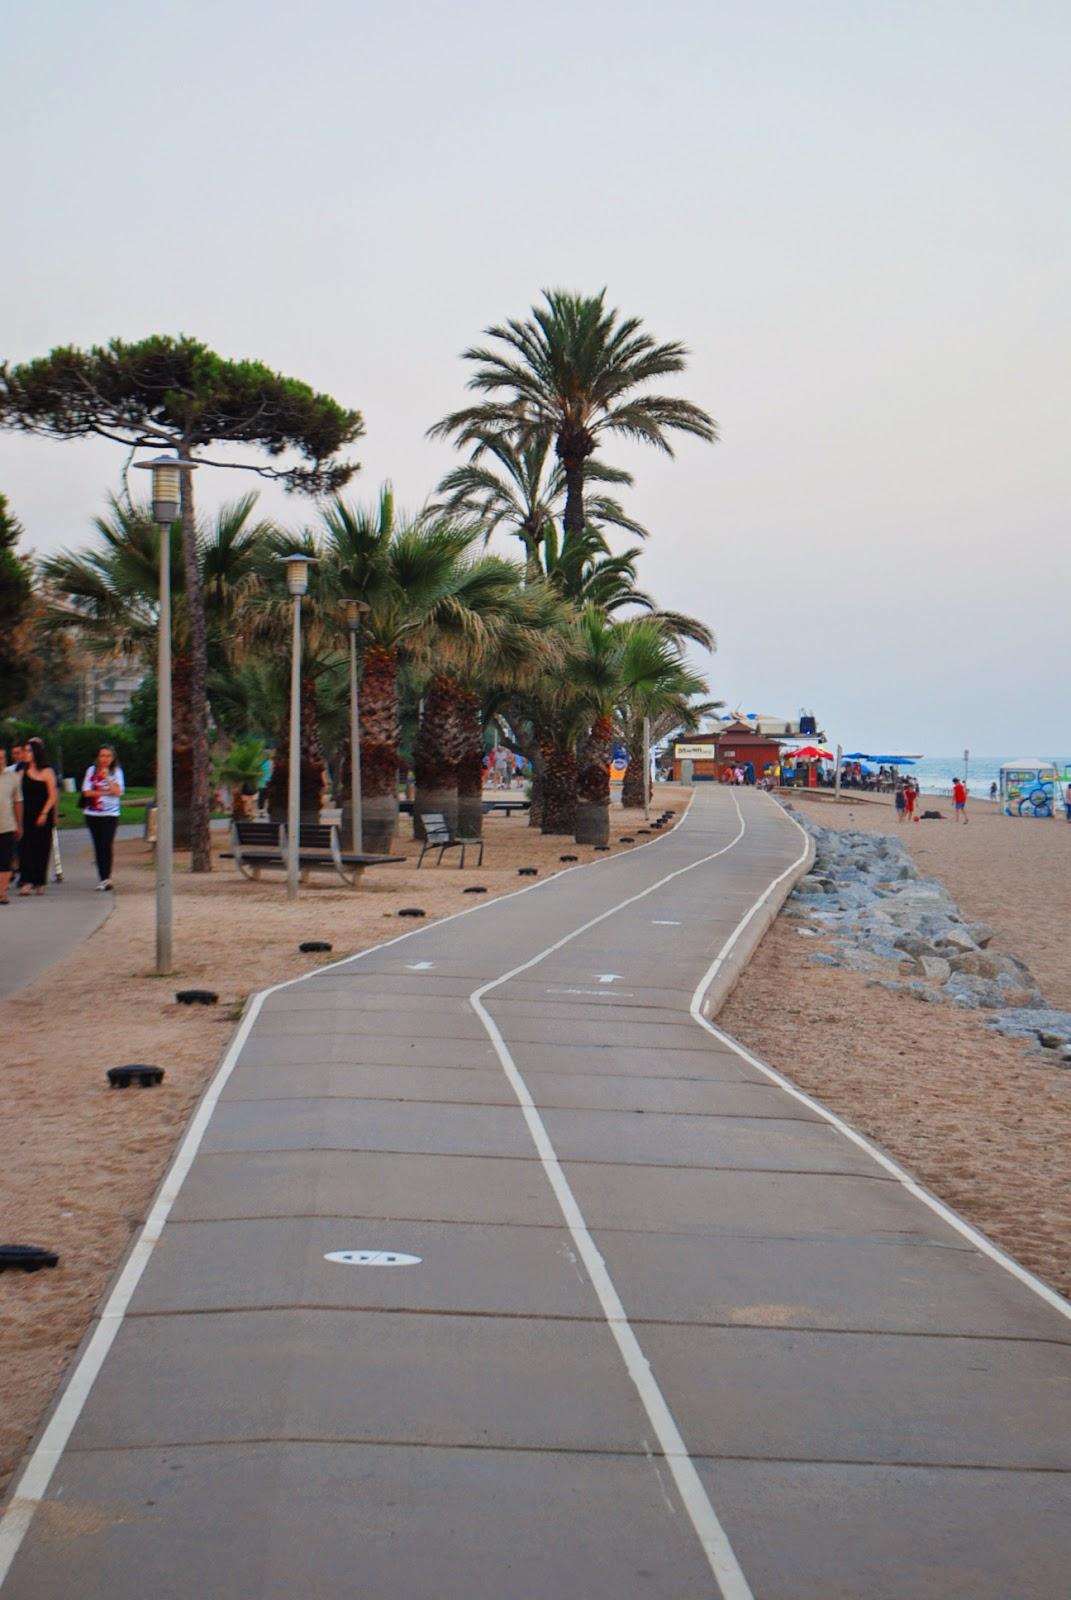 Пинеда де мар, Коста Брава, Каталония, Испания/Pineda de Mar, Costa Brava, Catalonia, Spain.